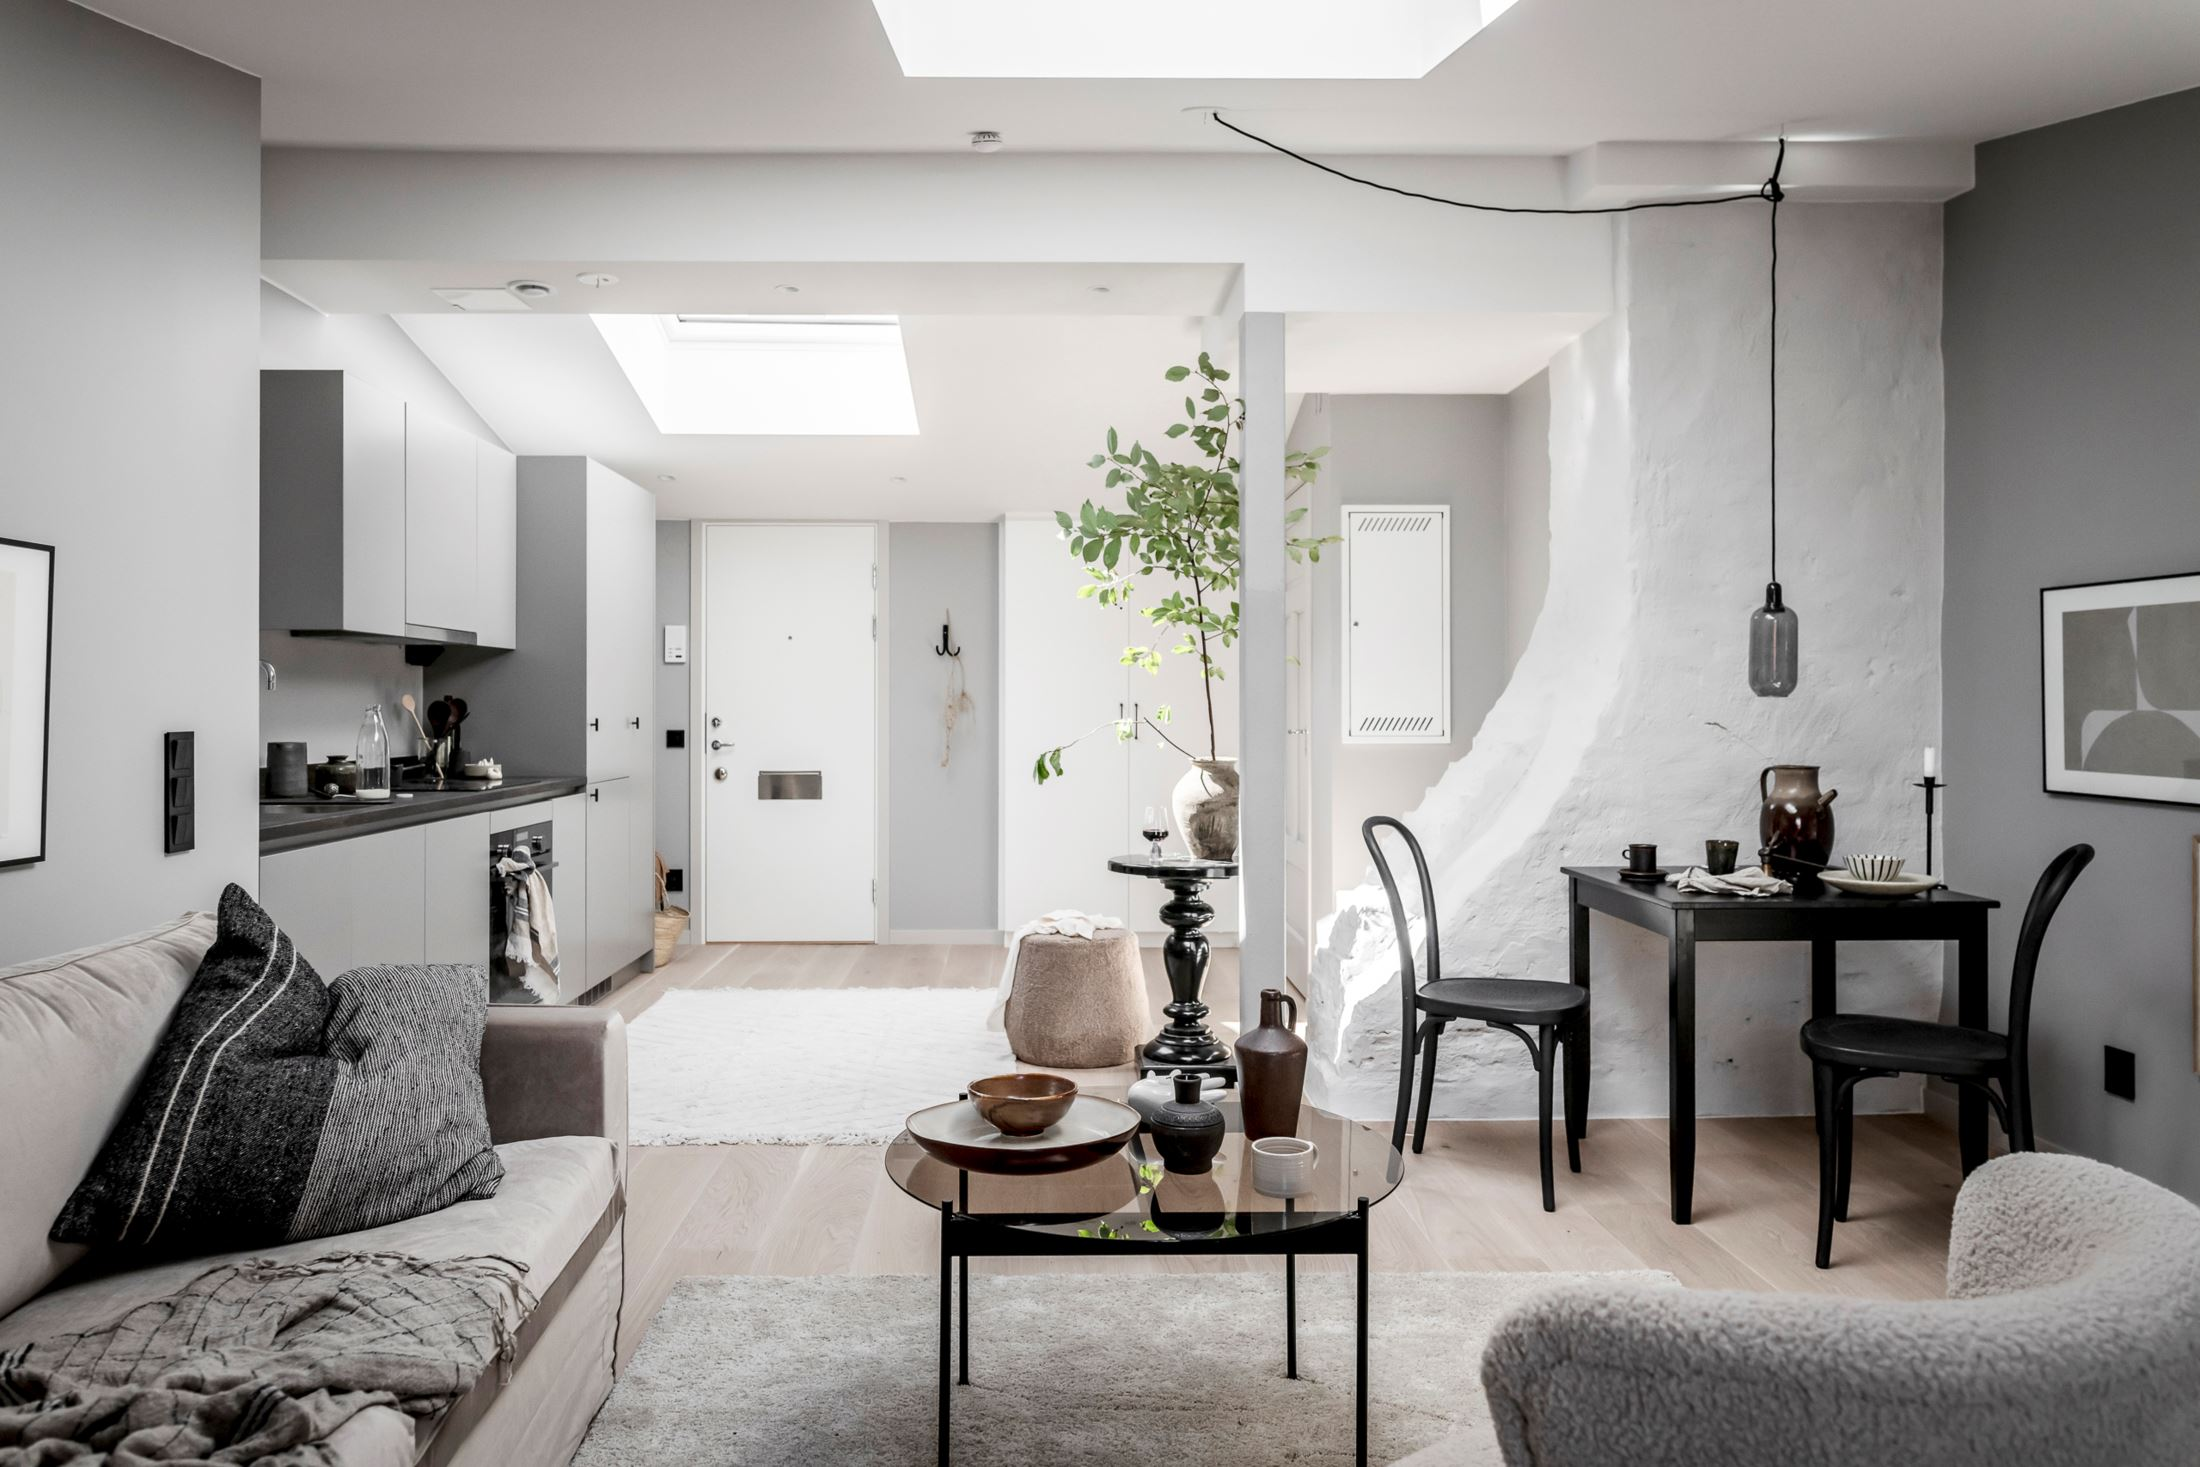 Plan deschis și decor nordic într o garsonieră la mansardă 35 m² 9